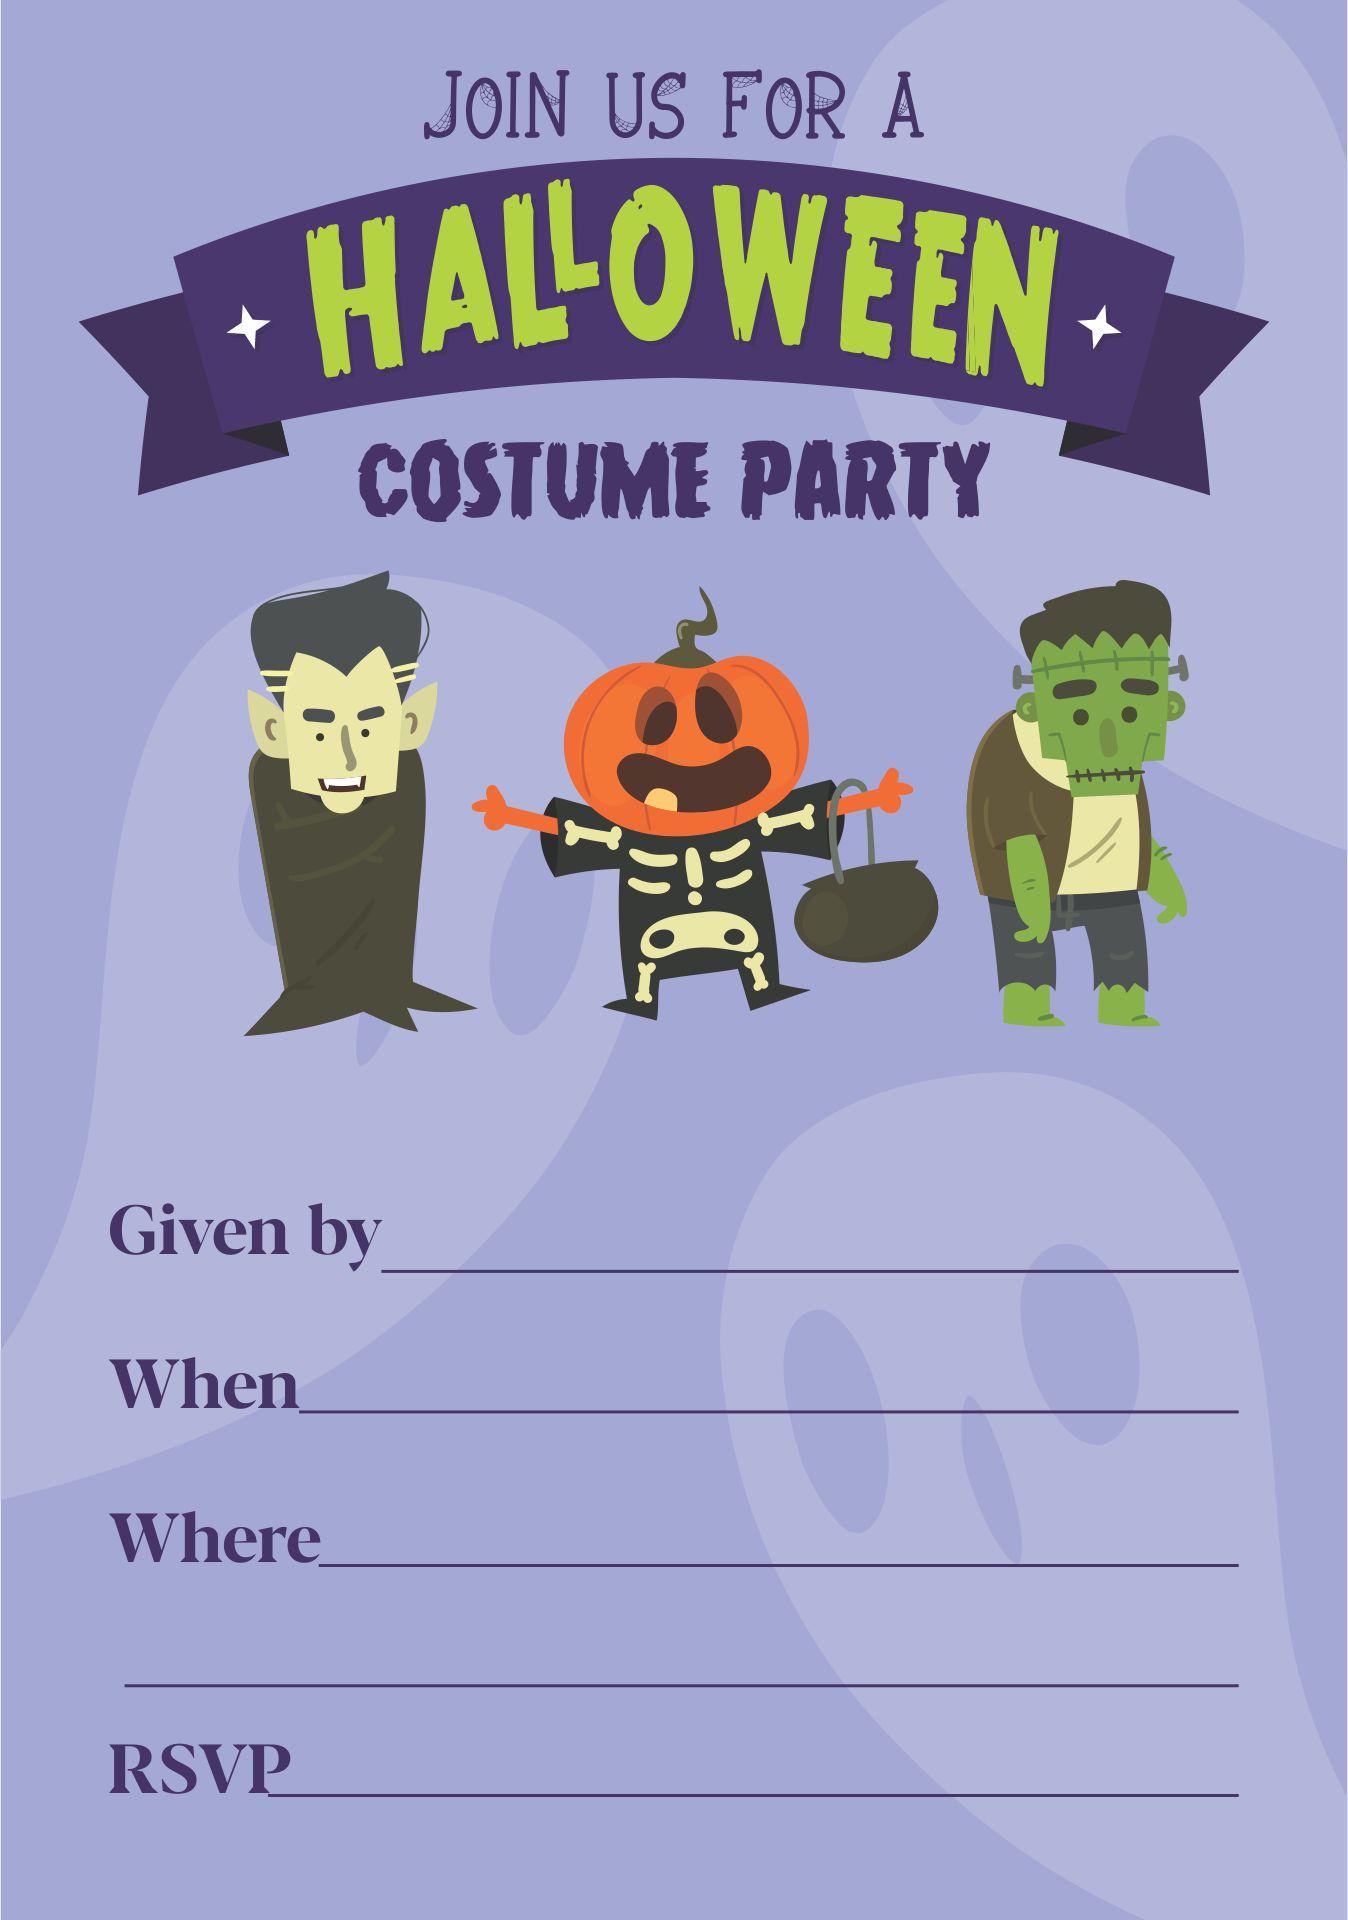 Printable Halloween Invitation Crafthubs – Free Printable Halloween Costume Party Invitations